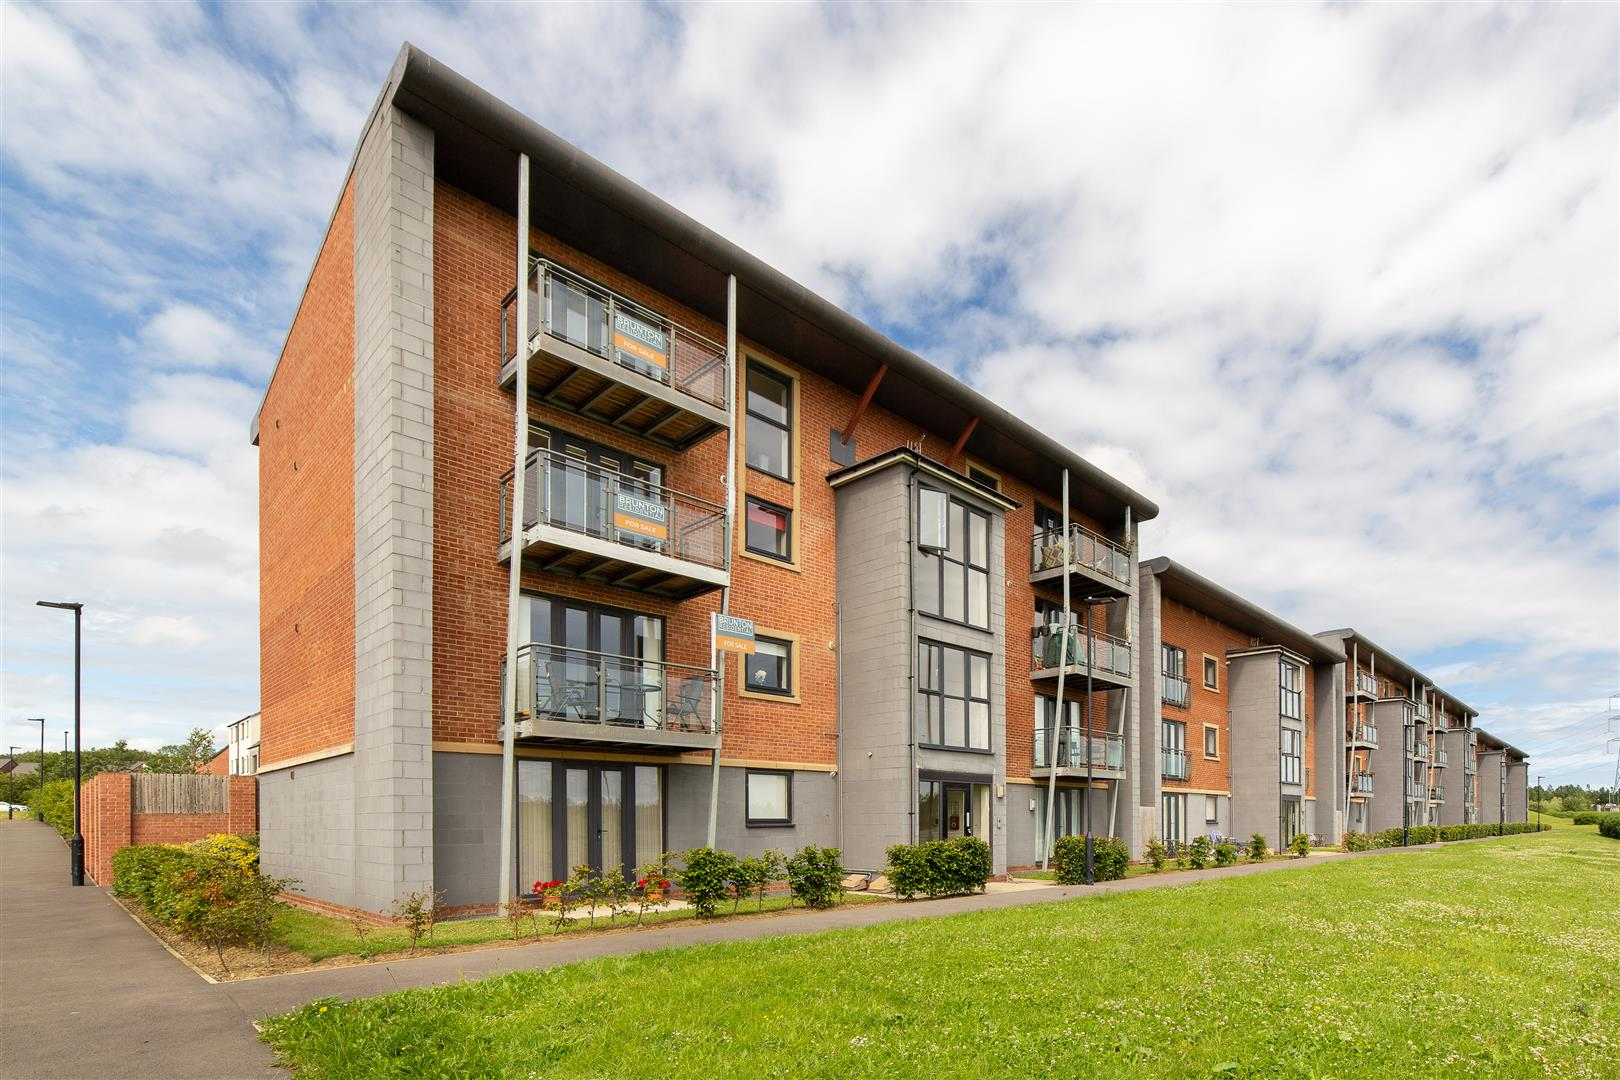 2 bed flat for sale in Elmwood Park Court, Great Park, NE13